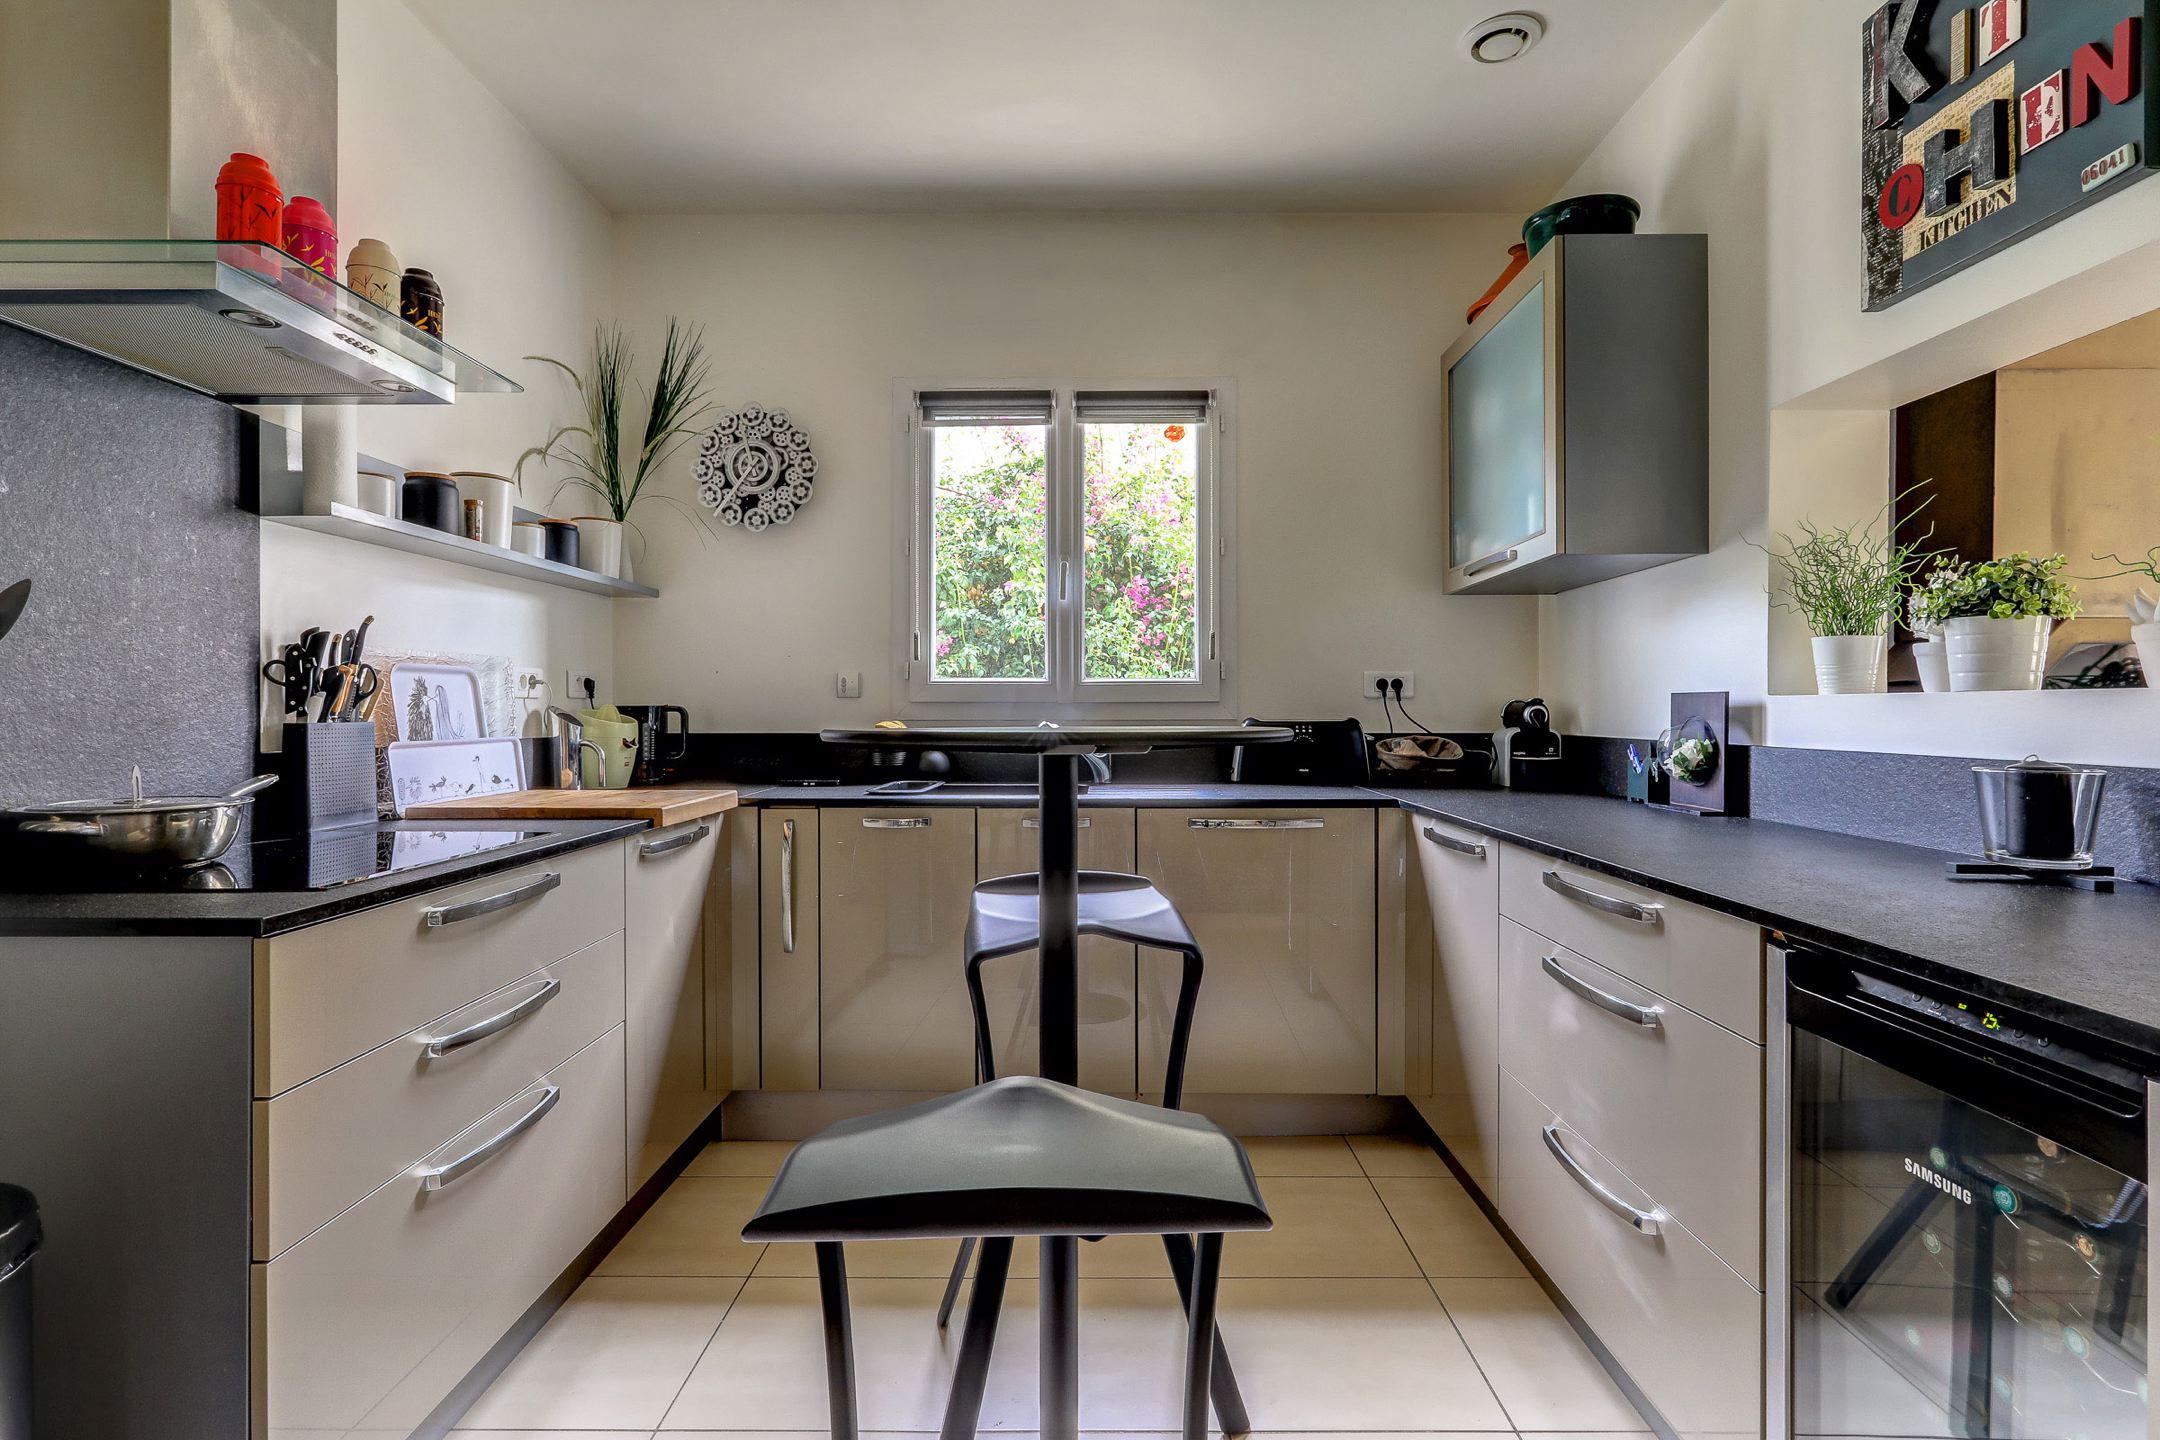 beaumont_13012_villapiscine_teck_contemporaine_terrasse_cuisine_saintjulien_saintbarnabe